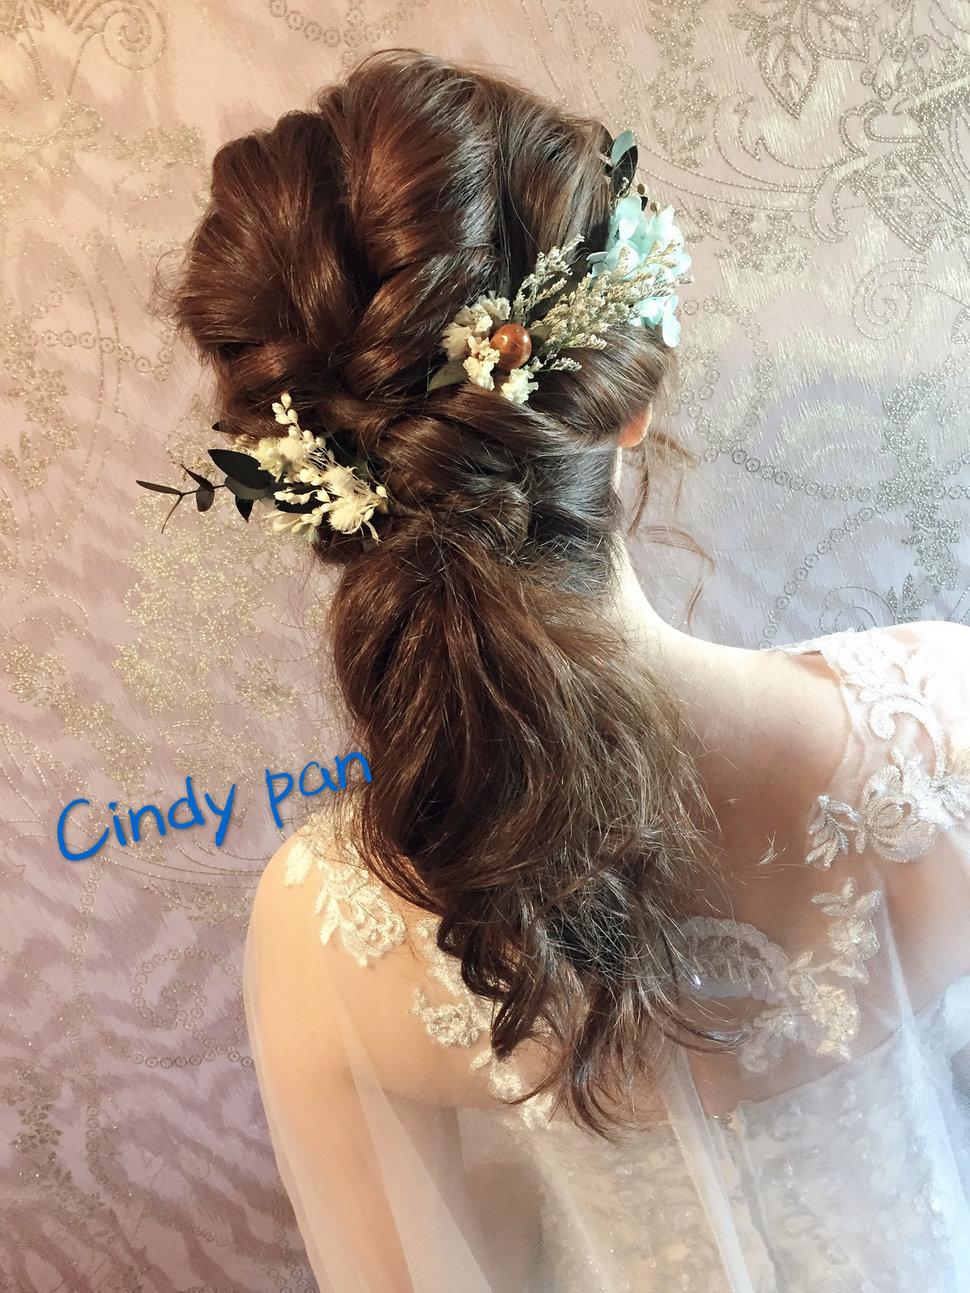 C33EAA25-CB45-4A09-B38F-3609F01F7B34 - 新娘秘書Cindy潘 - 結婚吧